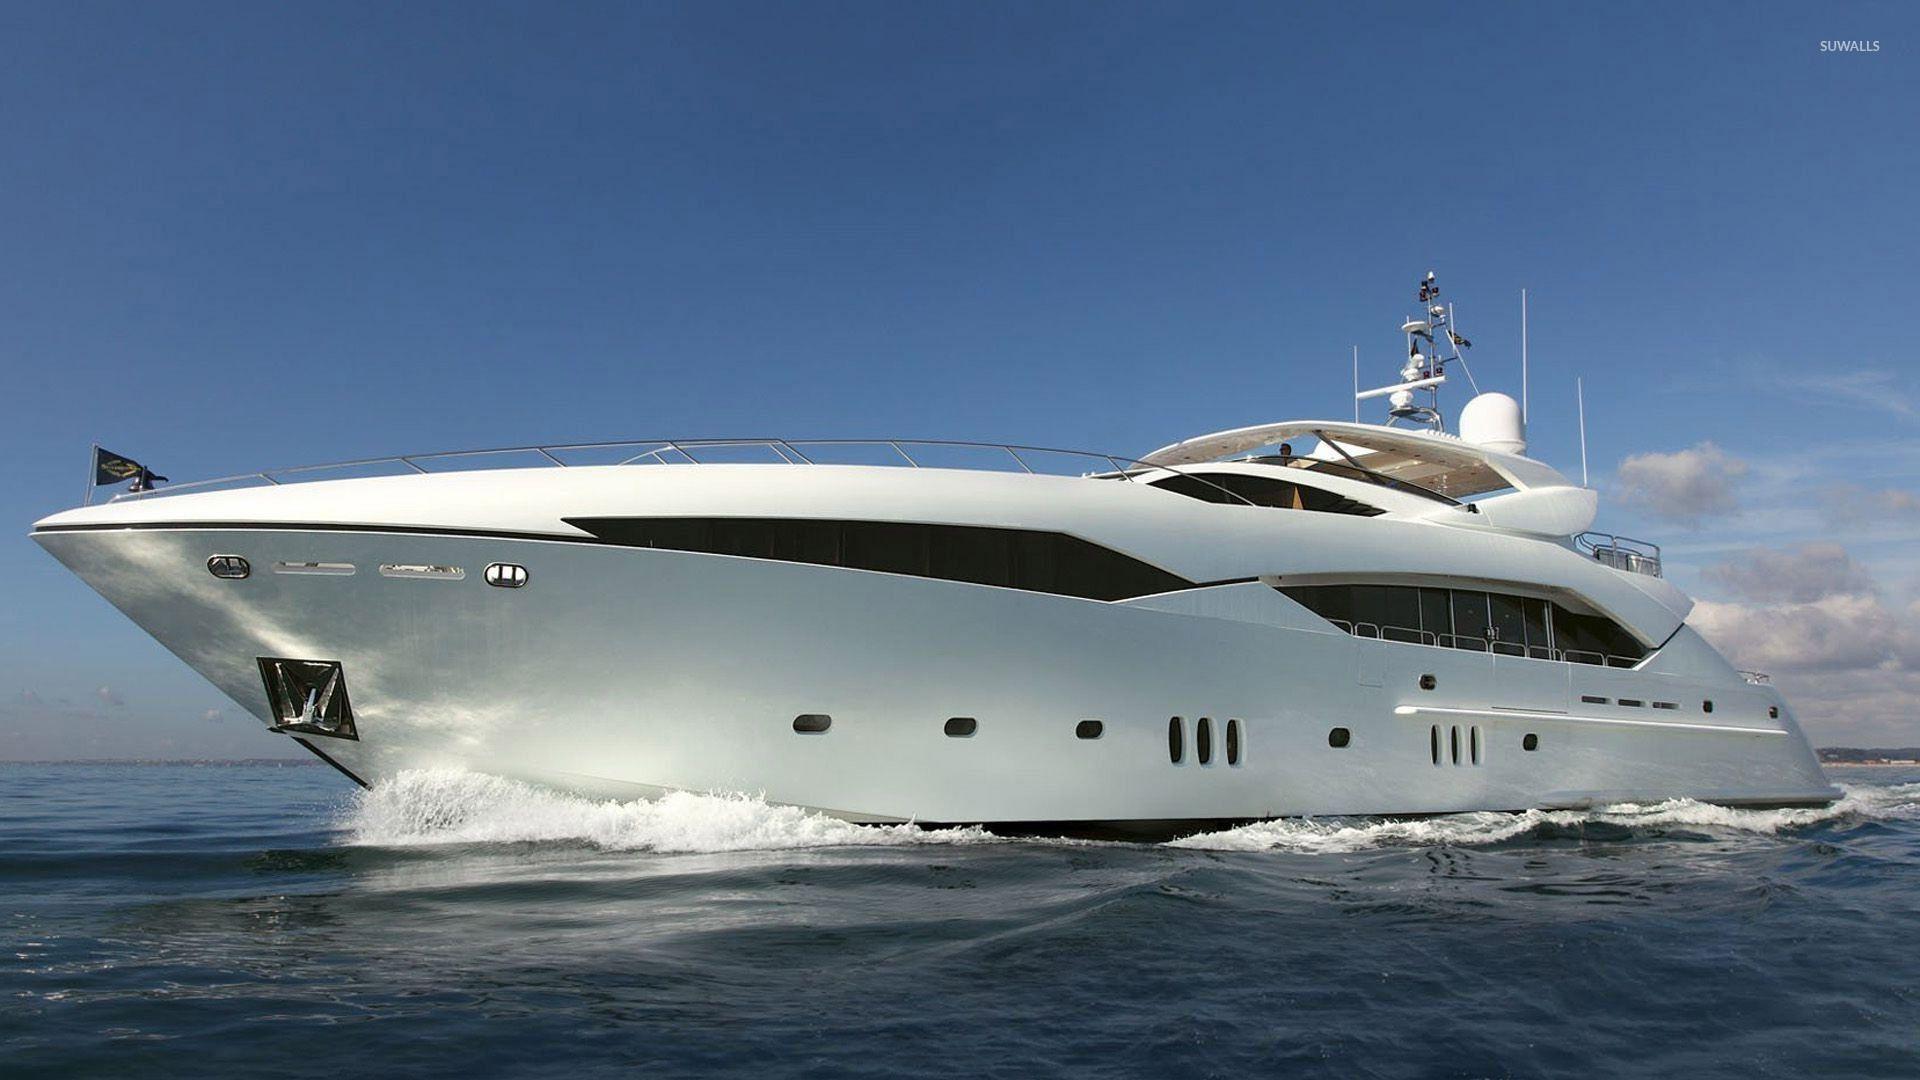 luxury super yacht wallpaper - photo #44